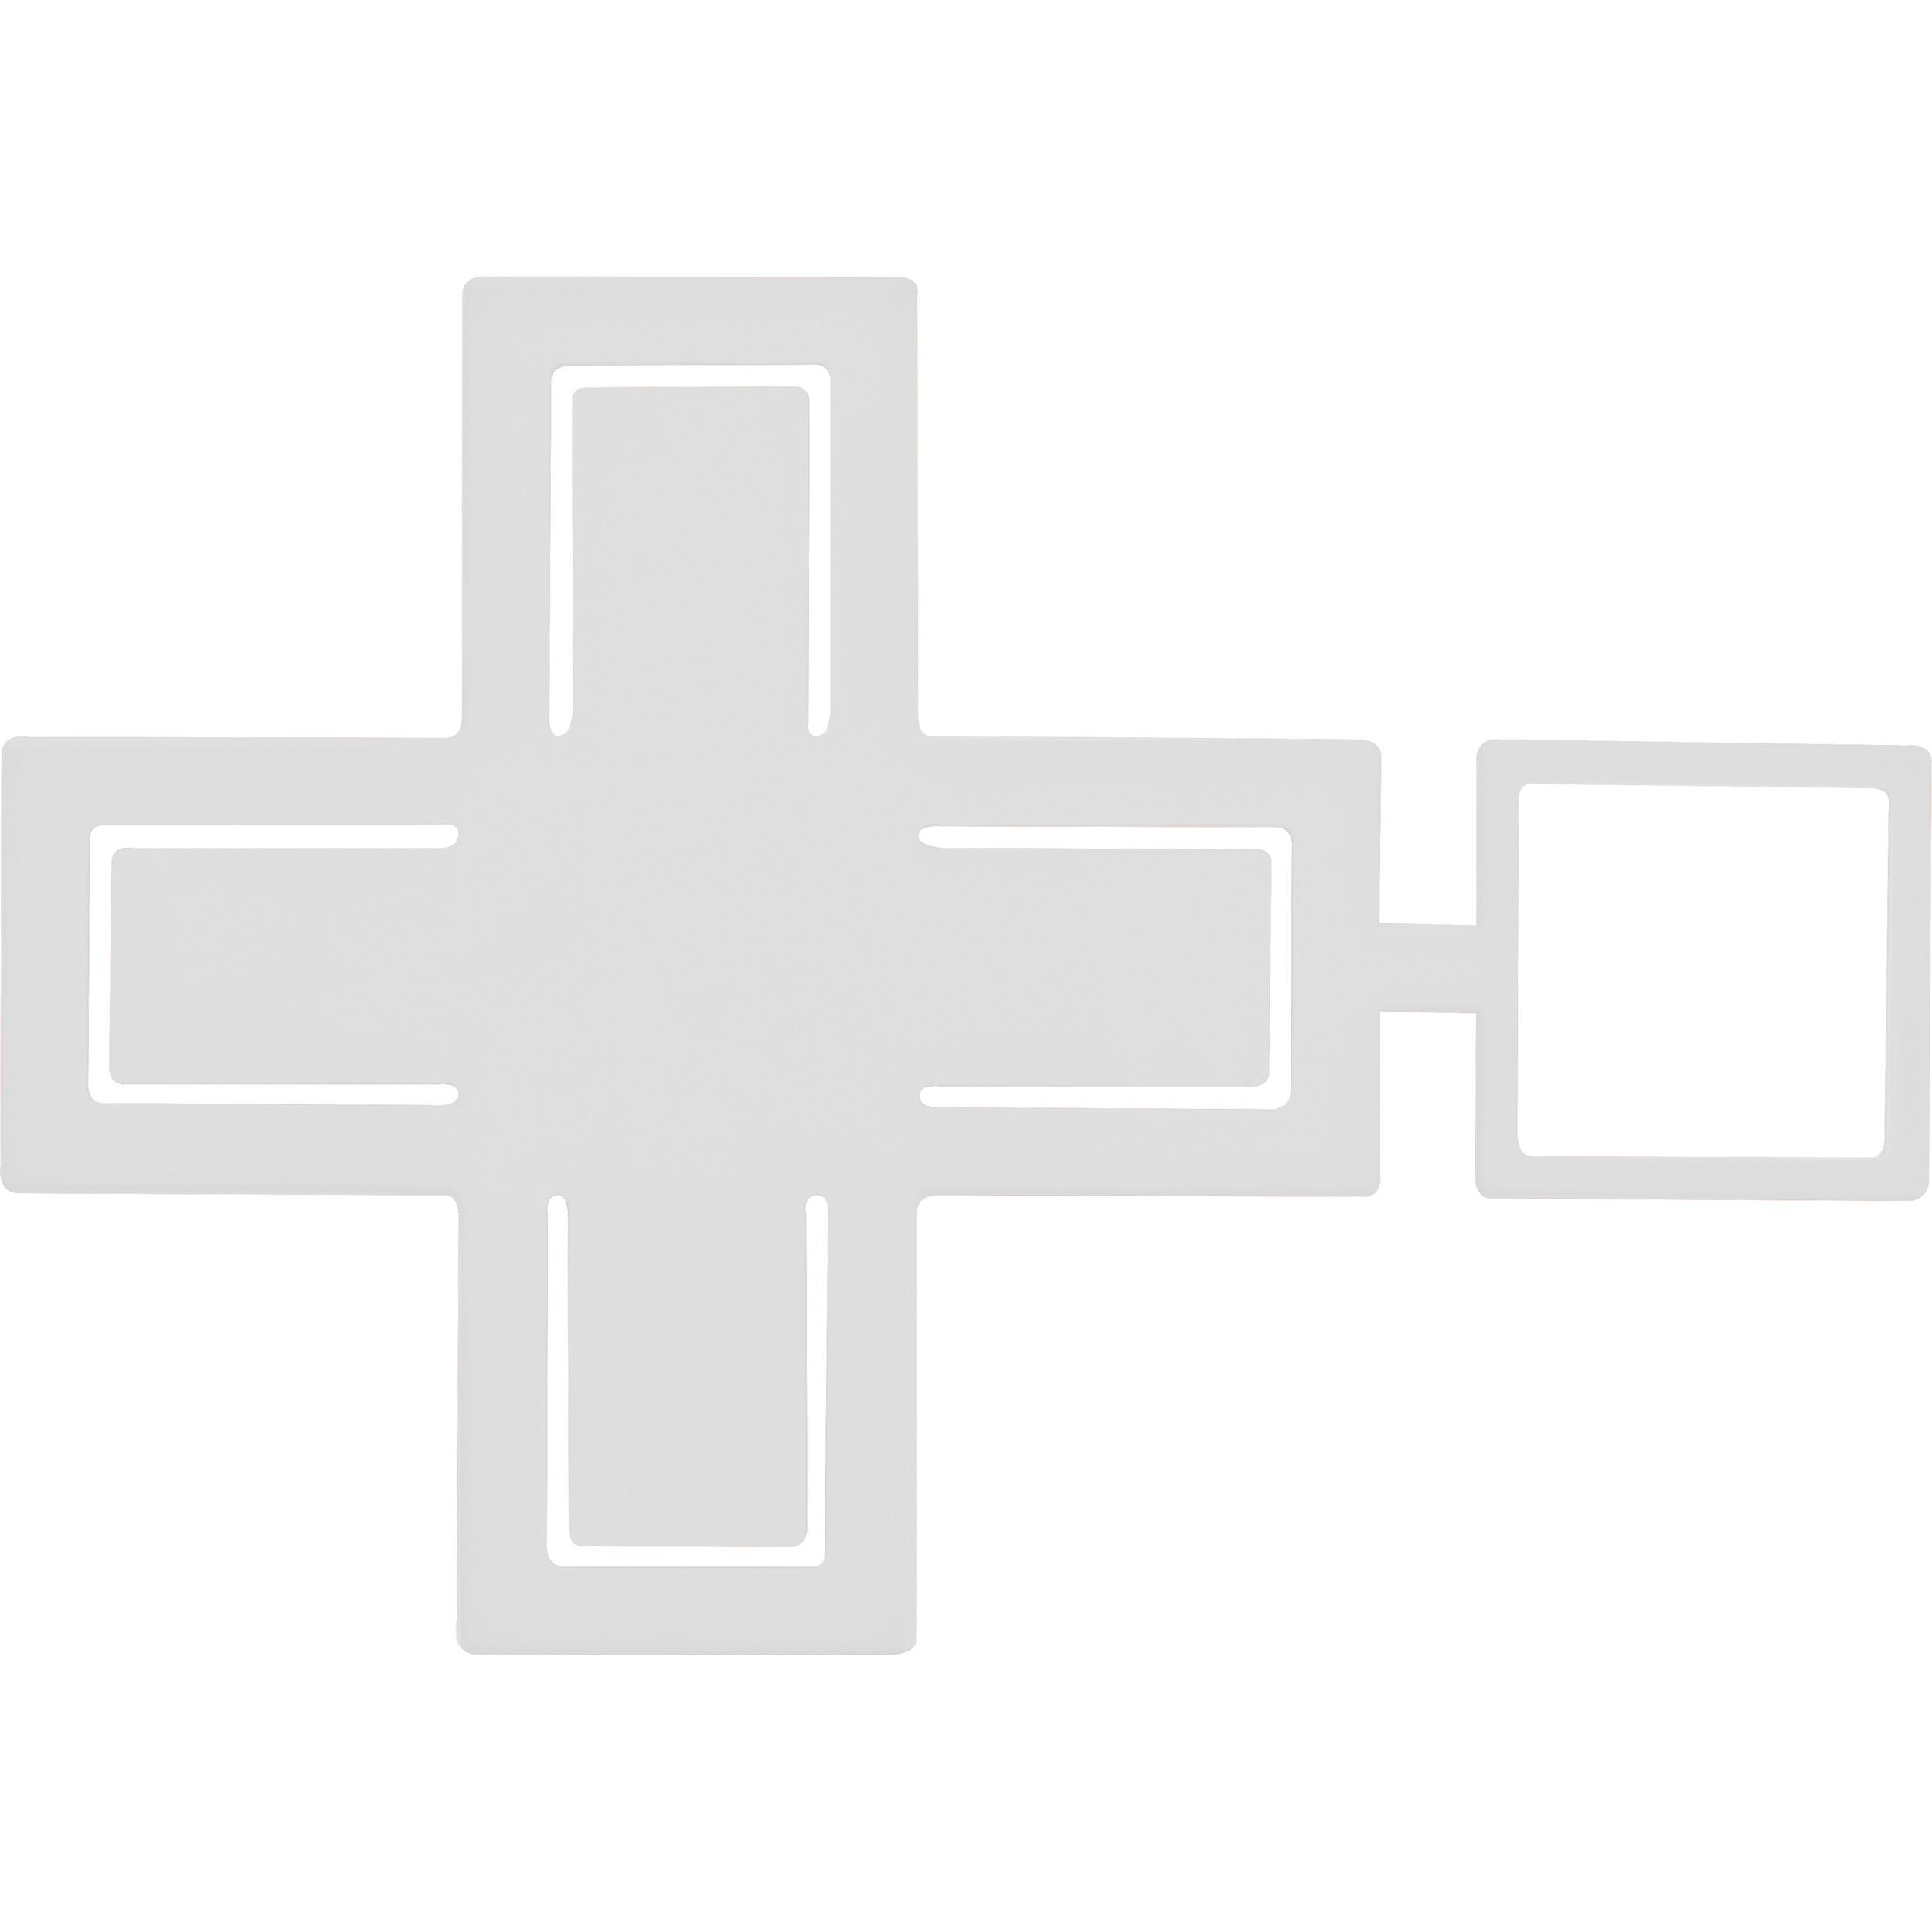 Support pour portable CROSS